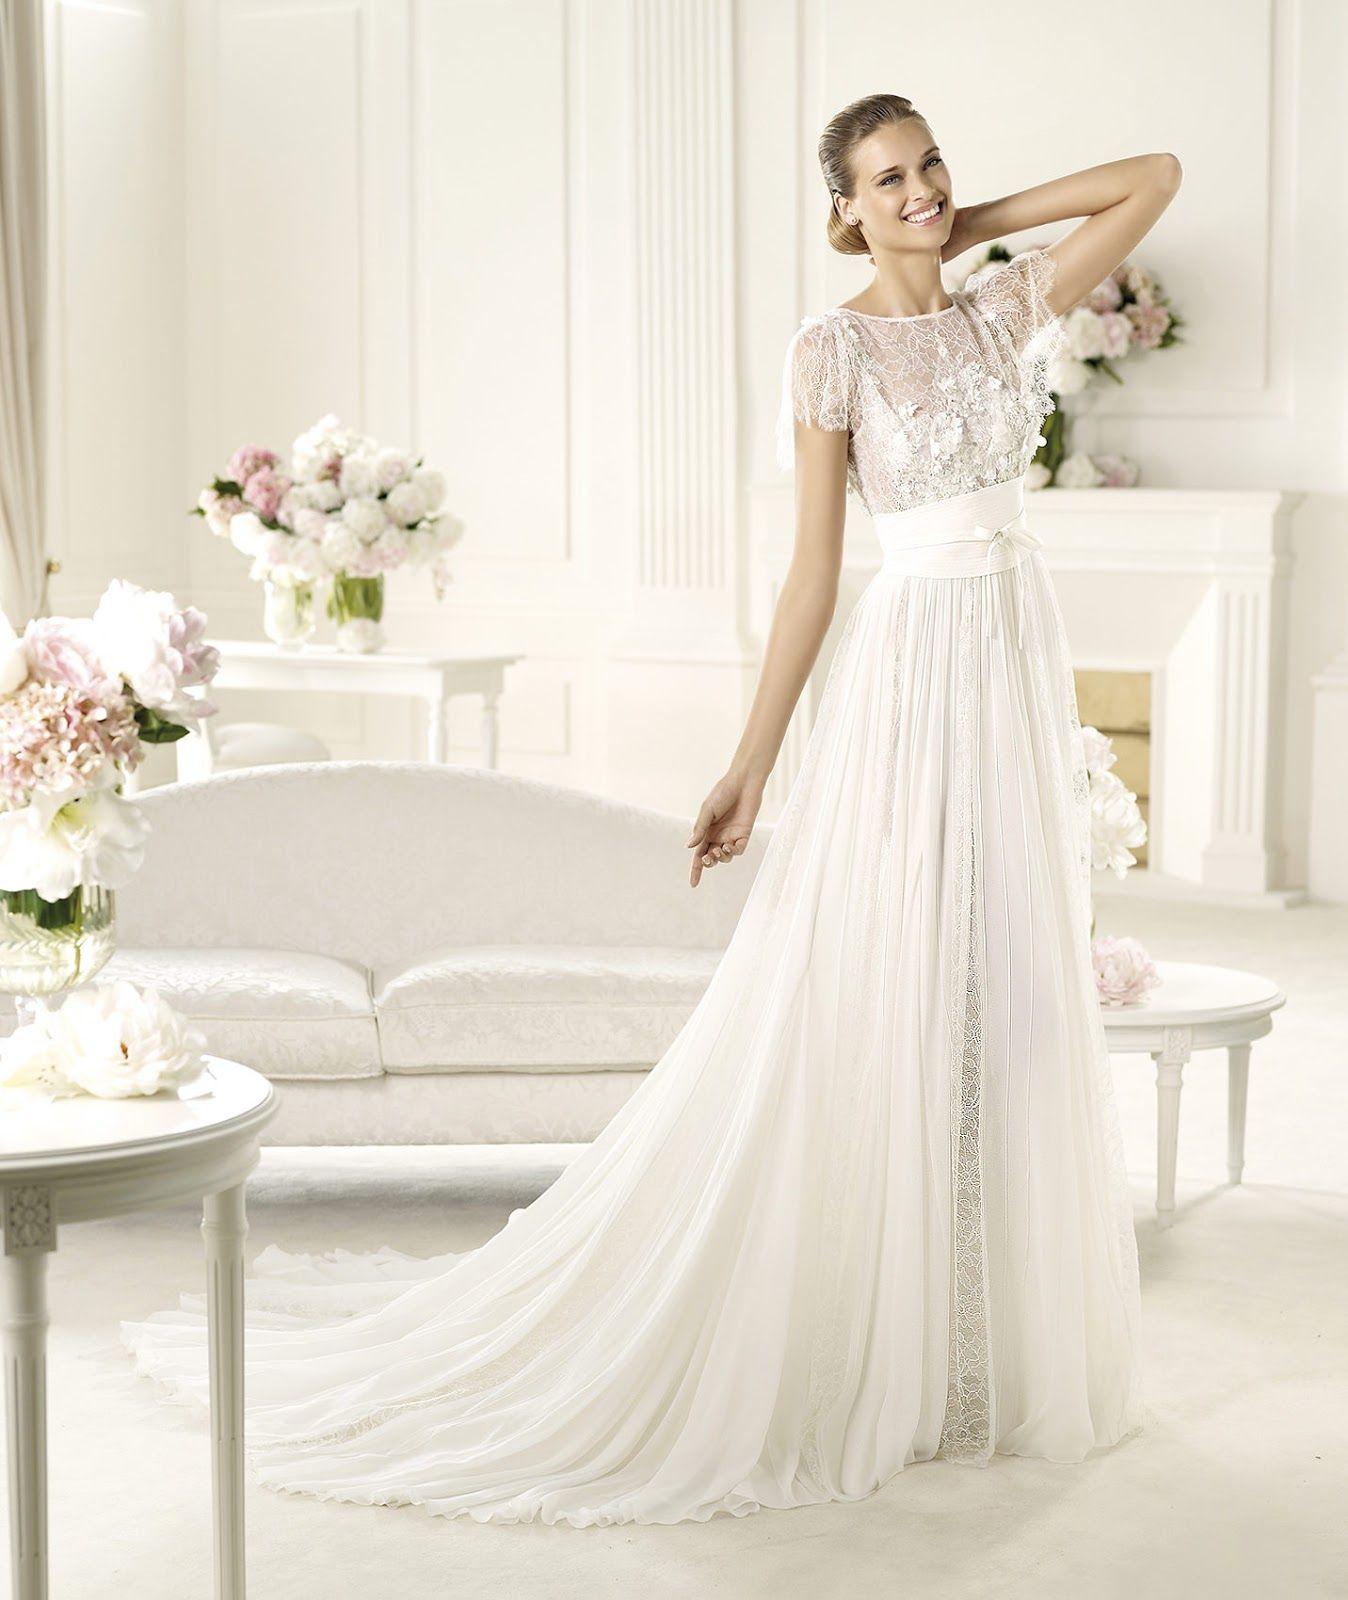 Elie by elie saab bridal collection wedding ideas pinterest